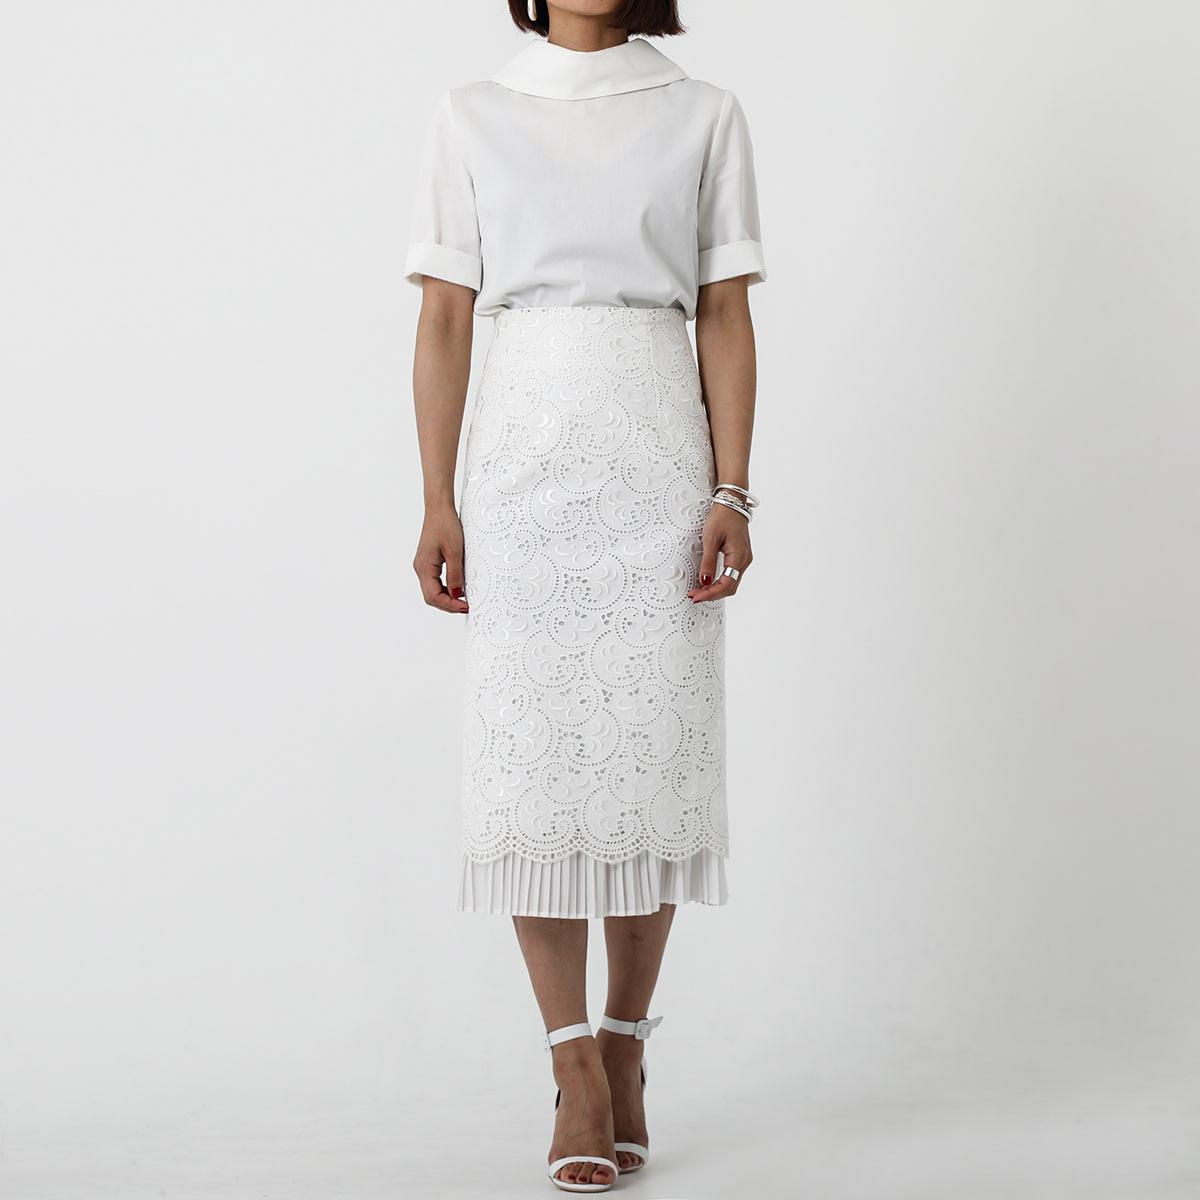 Kate lace white(全3色)画像